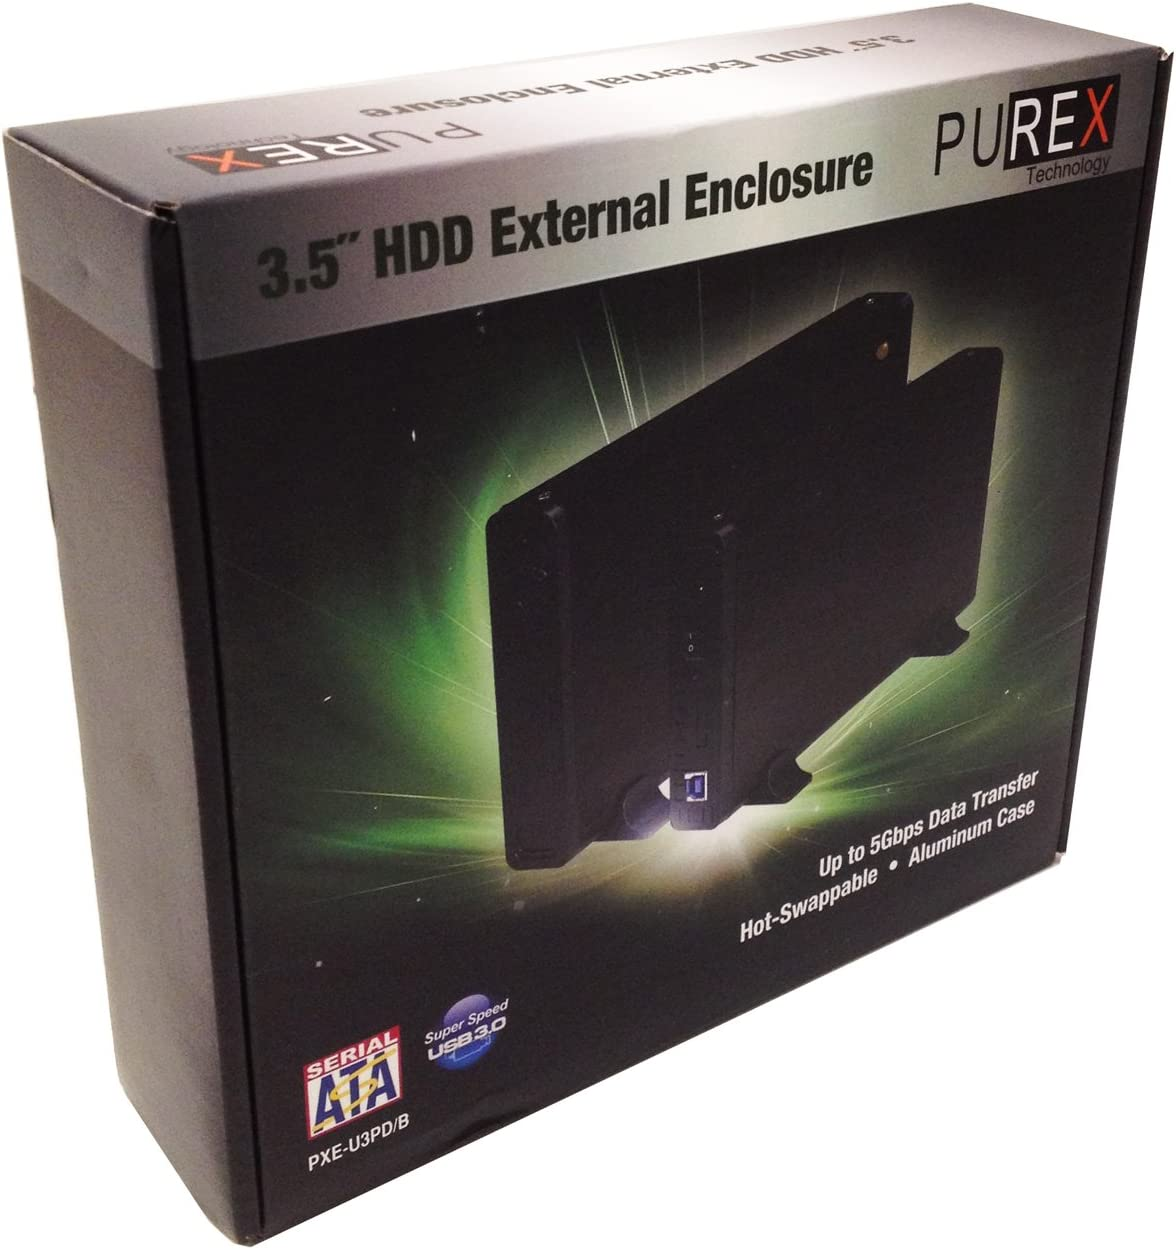 "PUREX Technology USB3.0 to 3.5/"" External SATA HDD Enclosure PXE-U3PD//B"